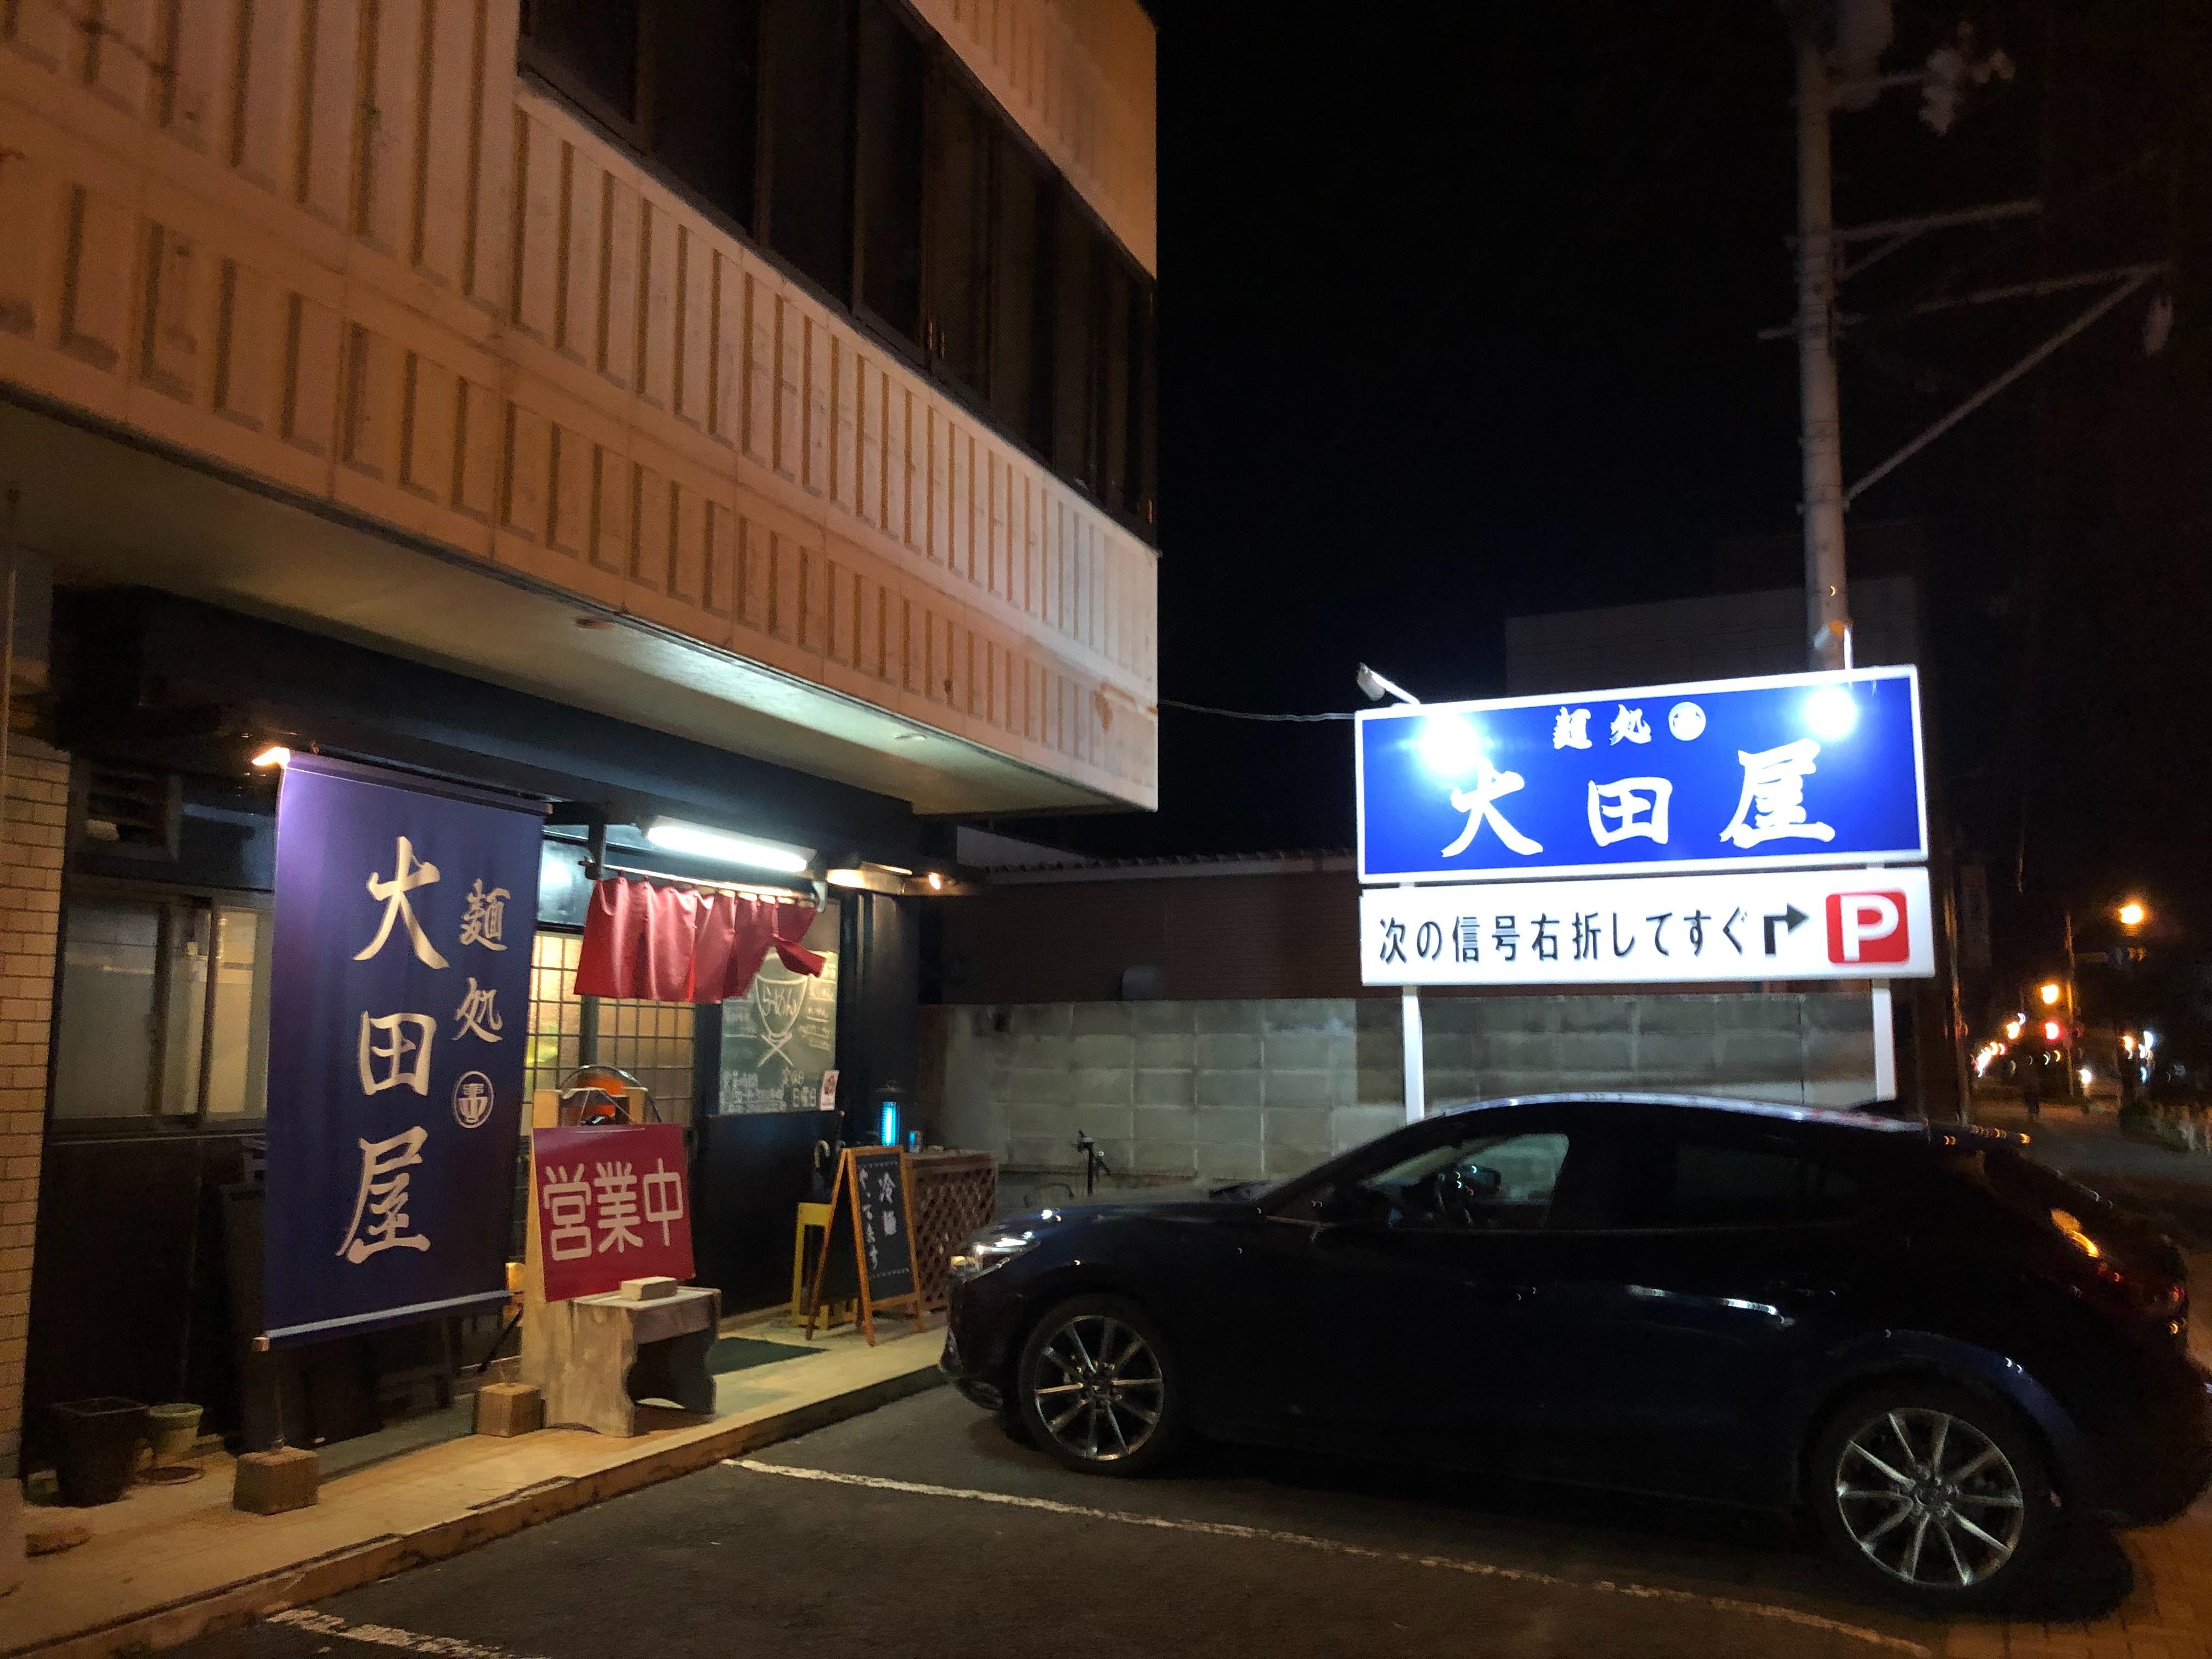 f:id:masanori-kato1972:20190808205251j:image